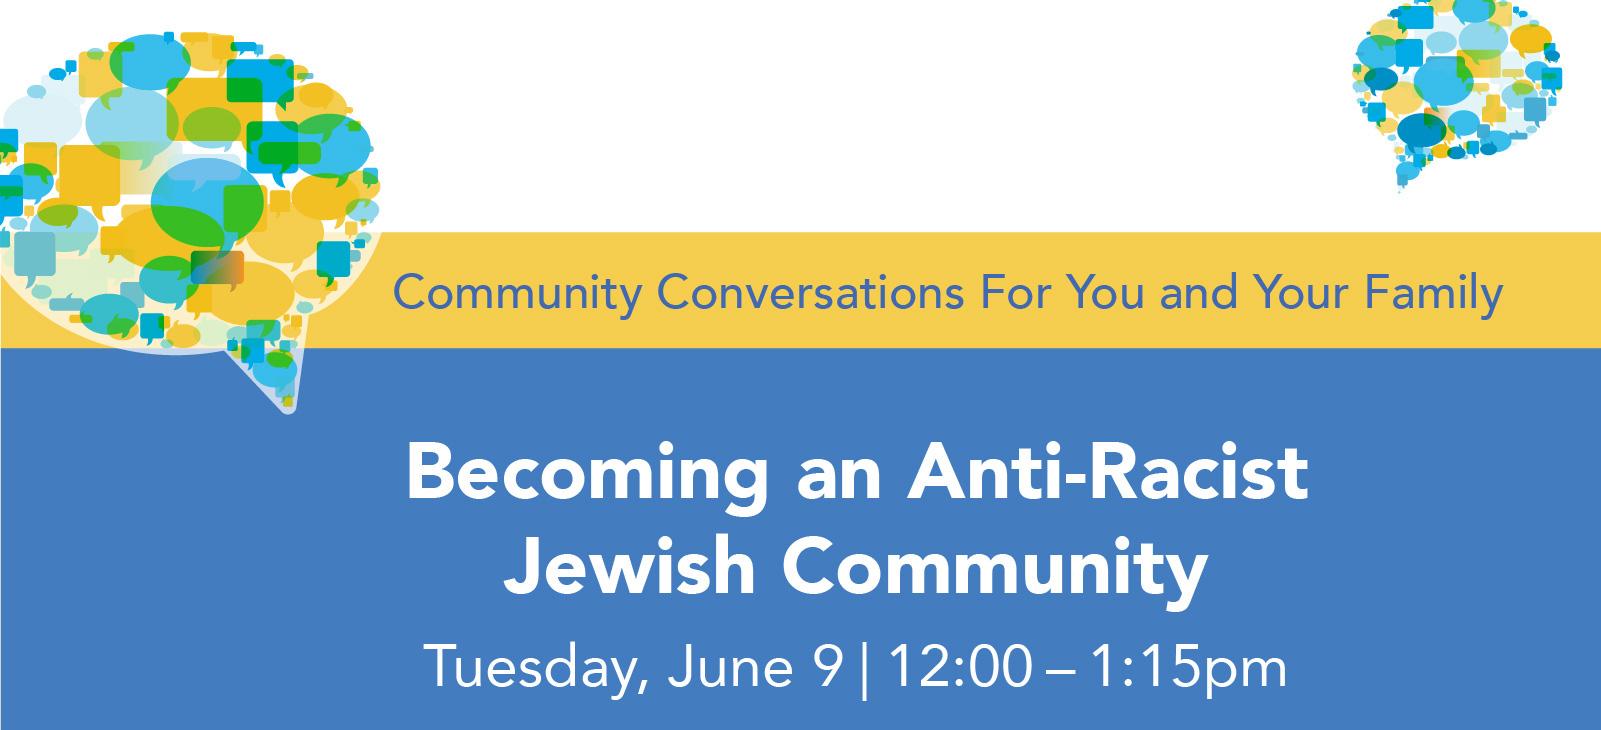 Becoming an Anti-Racist Jewish Community graphic